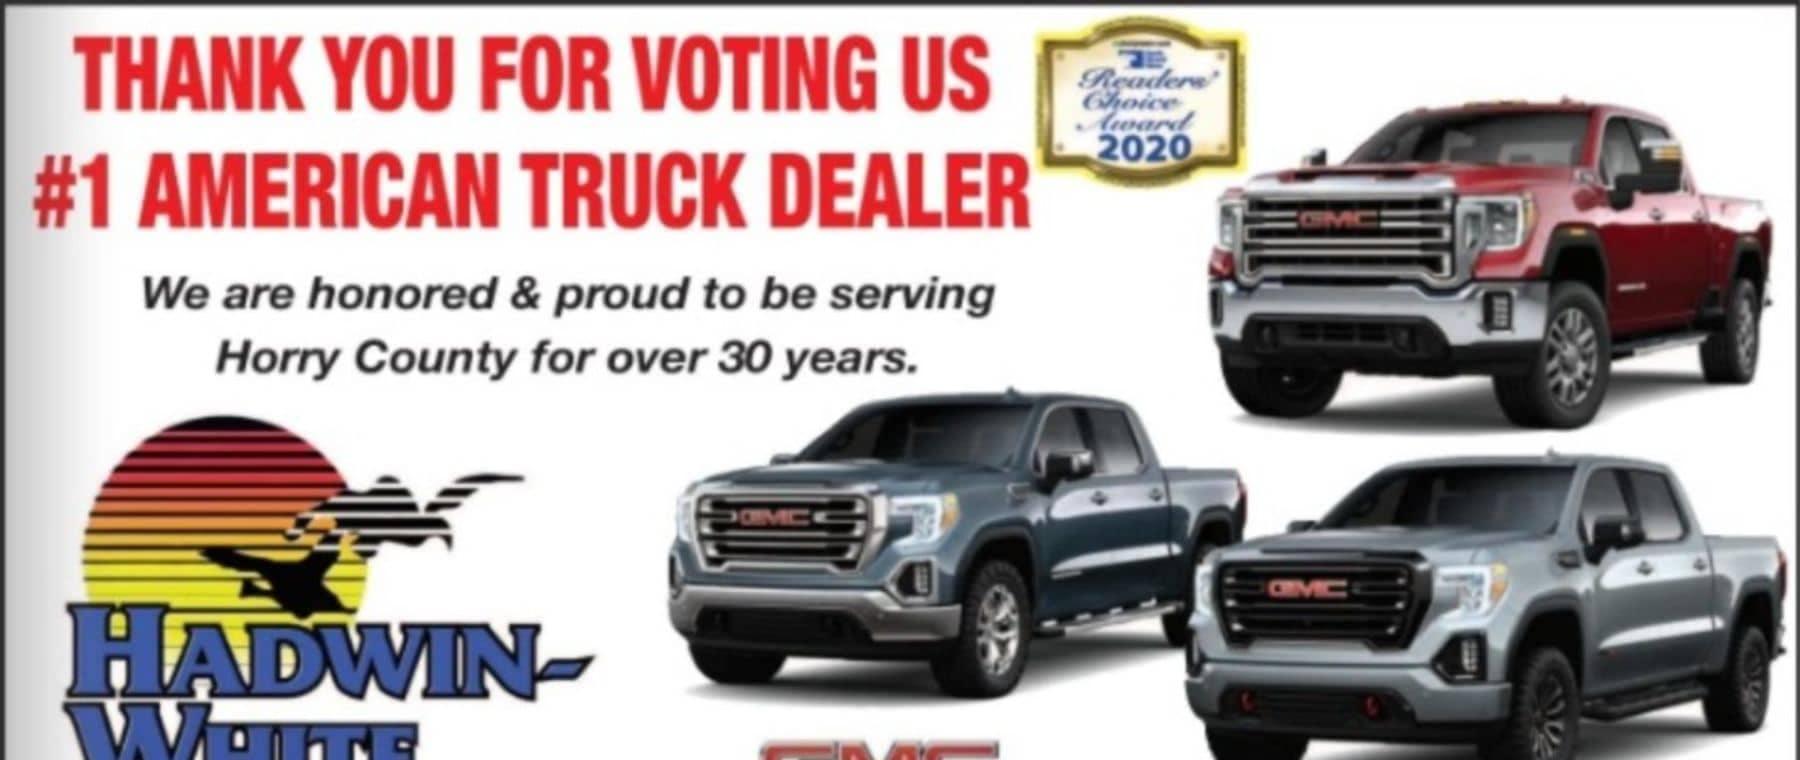 #1 Truck Dealer